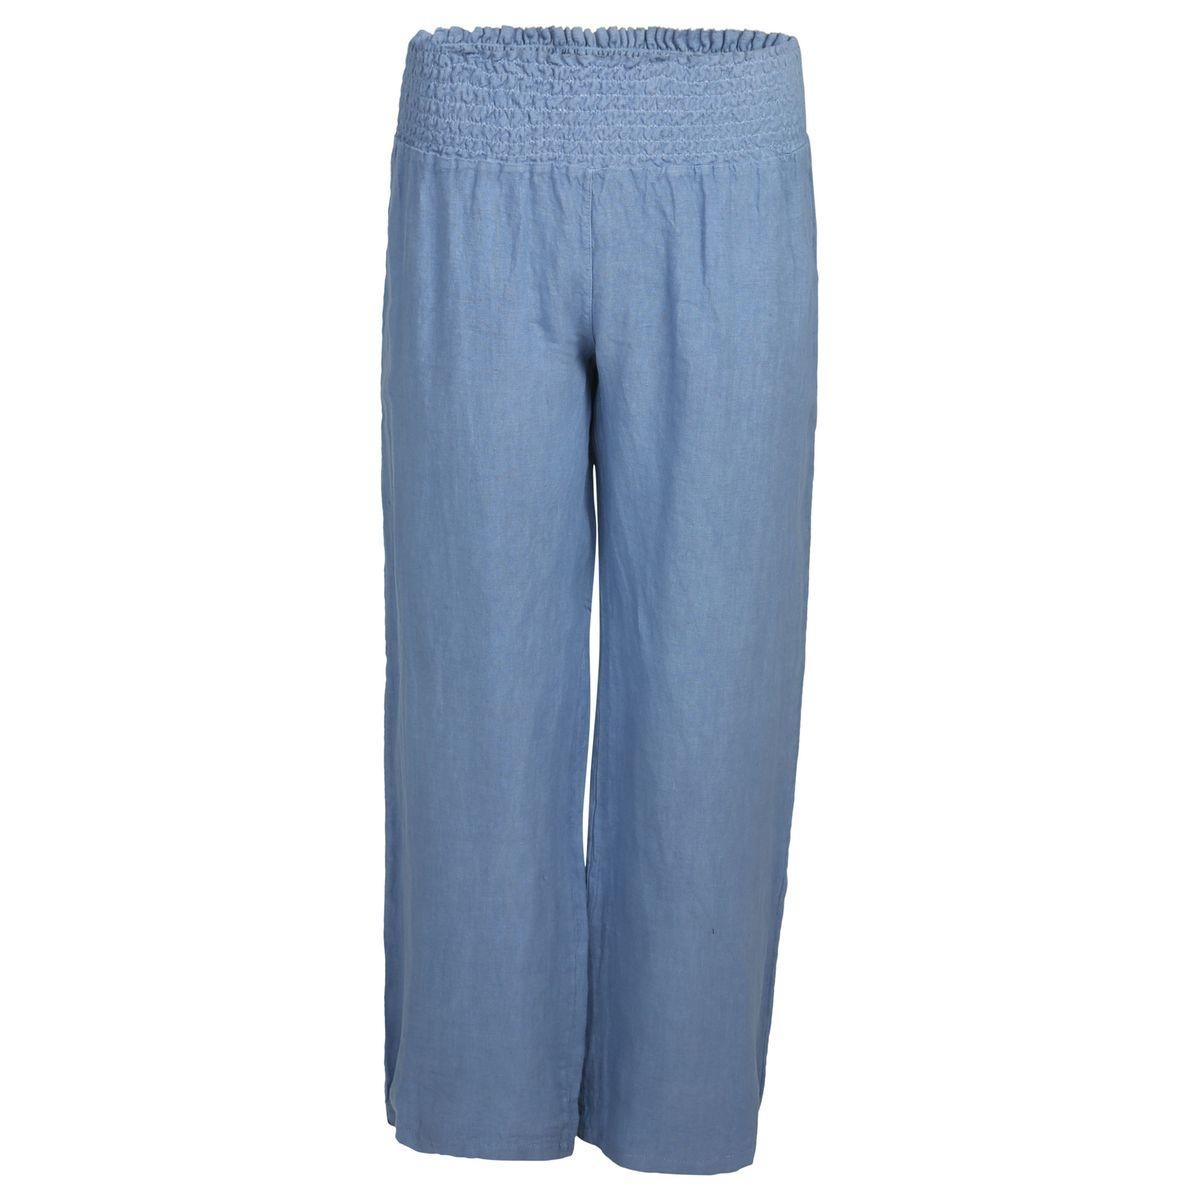 Pantalon en lin ceinture smockée